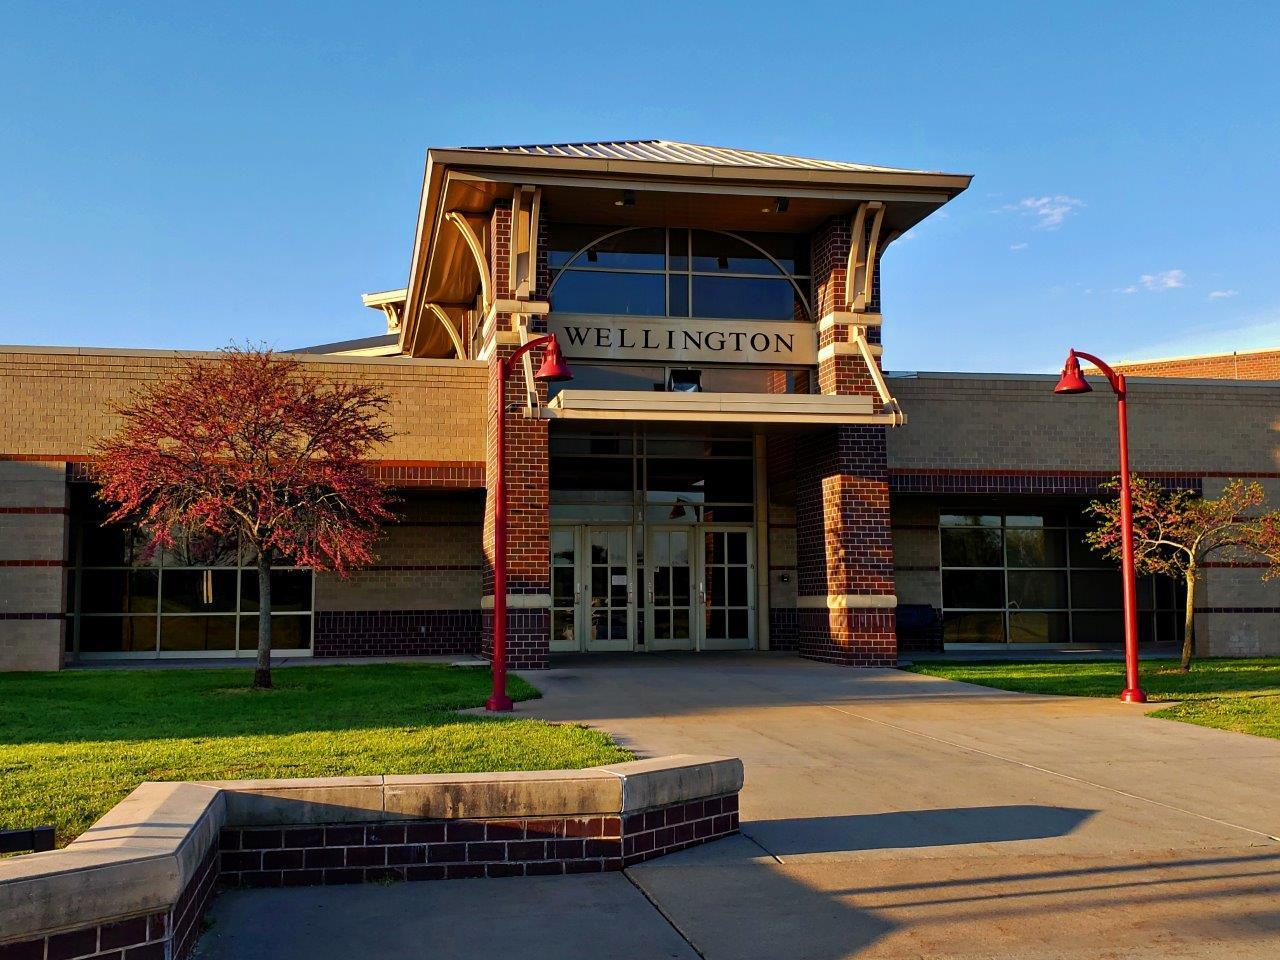 Wellington High School Entrance